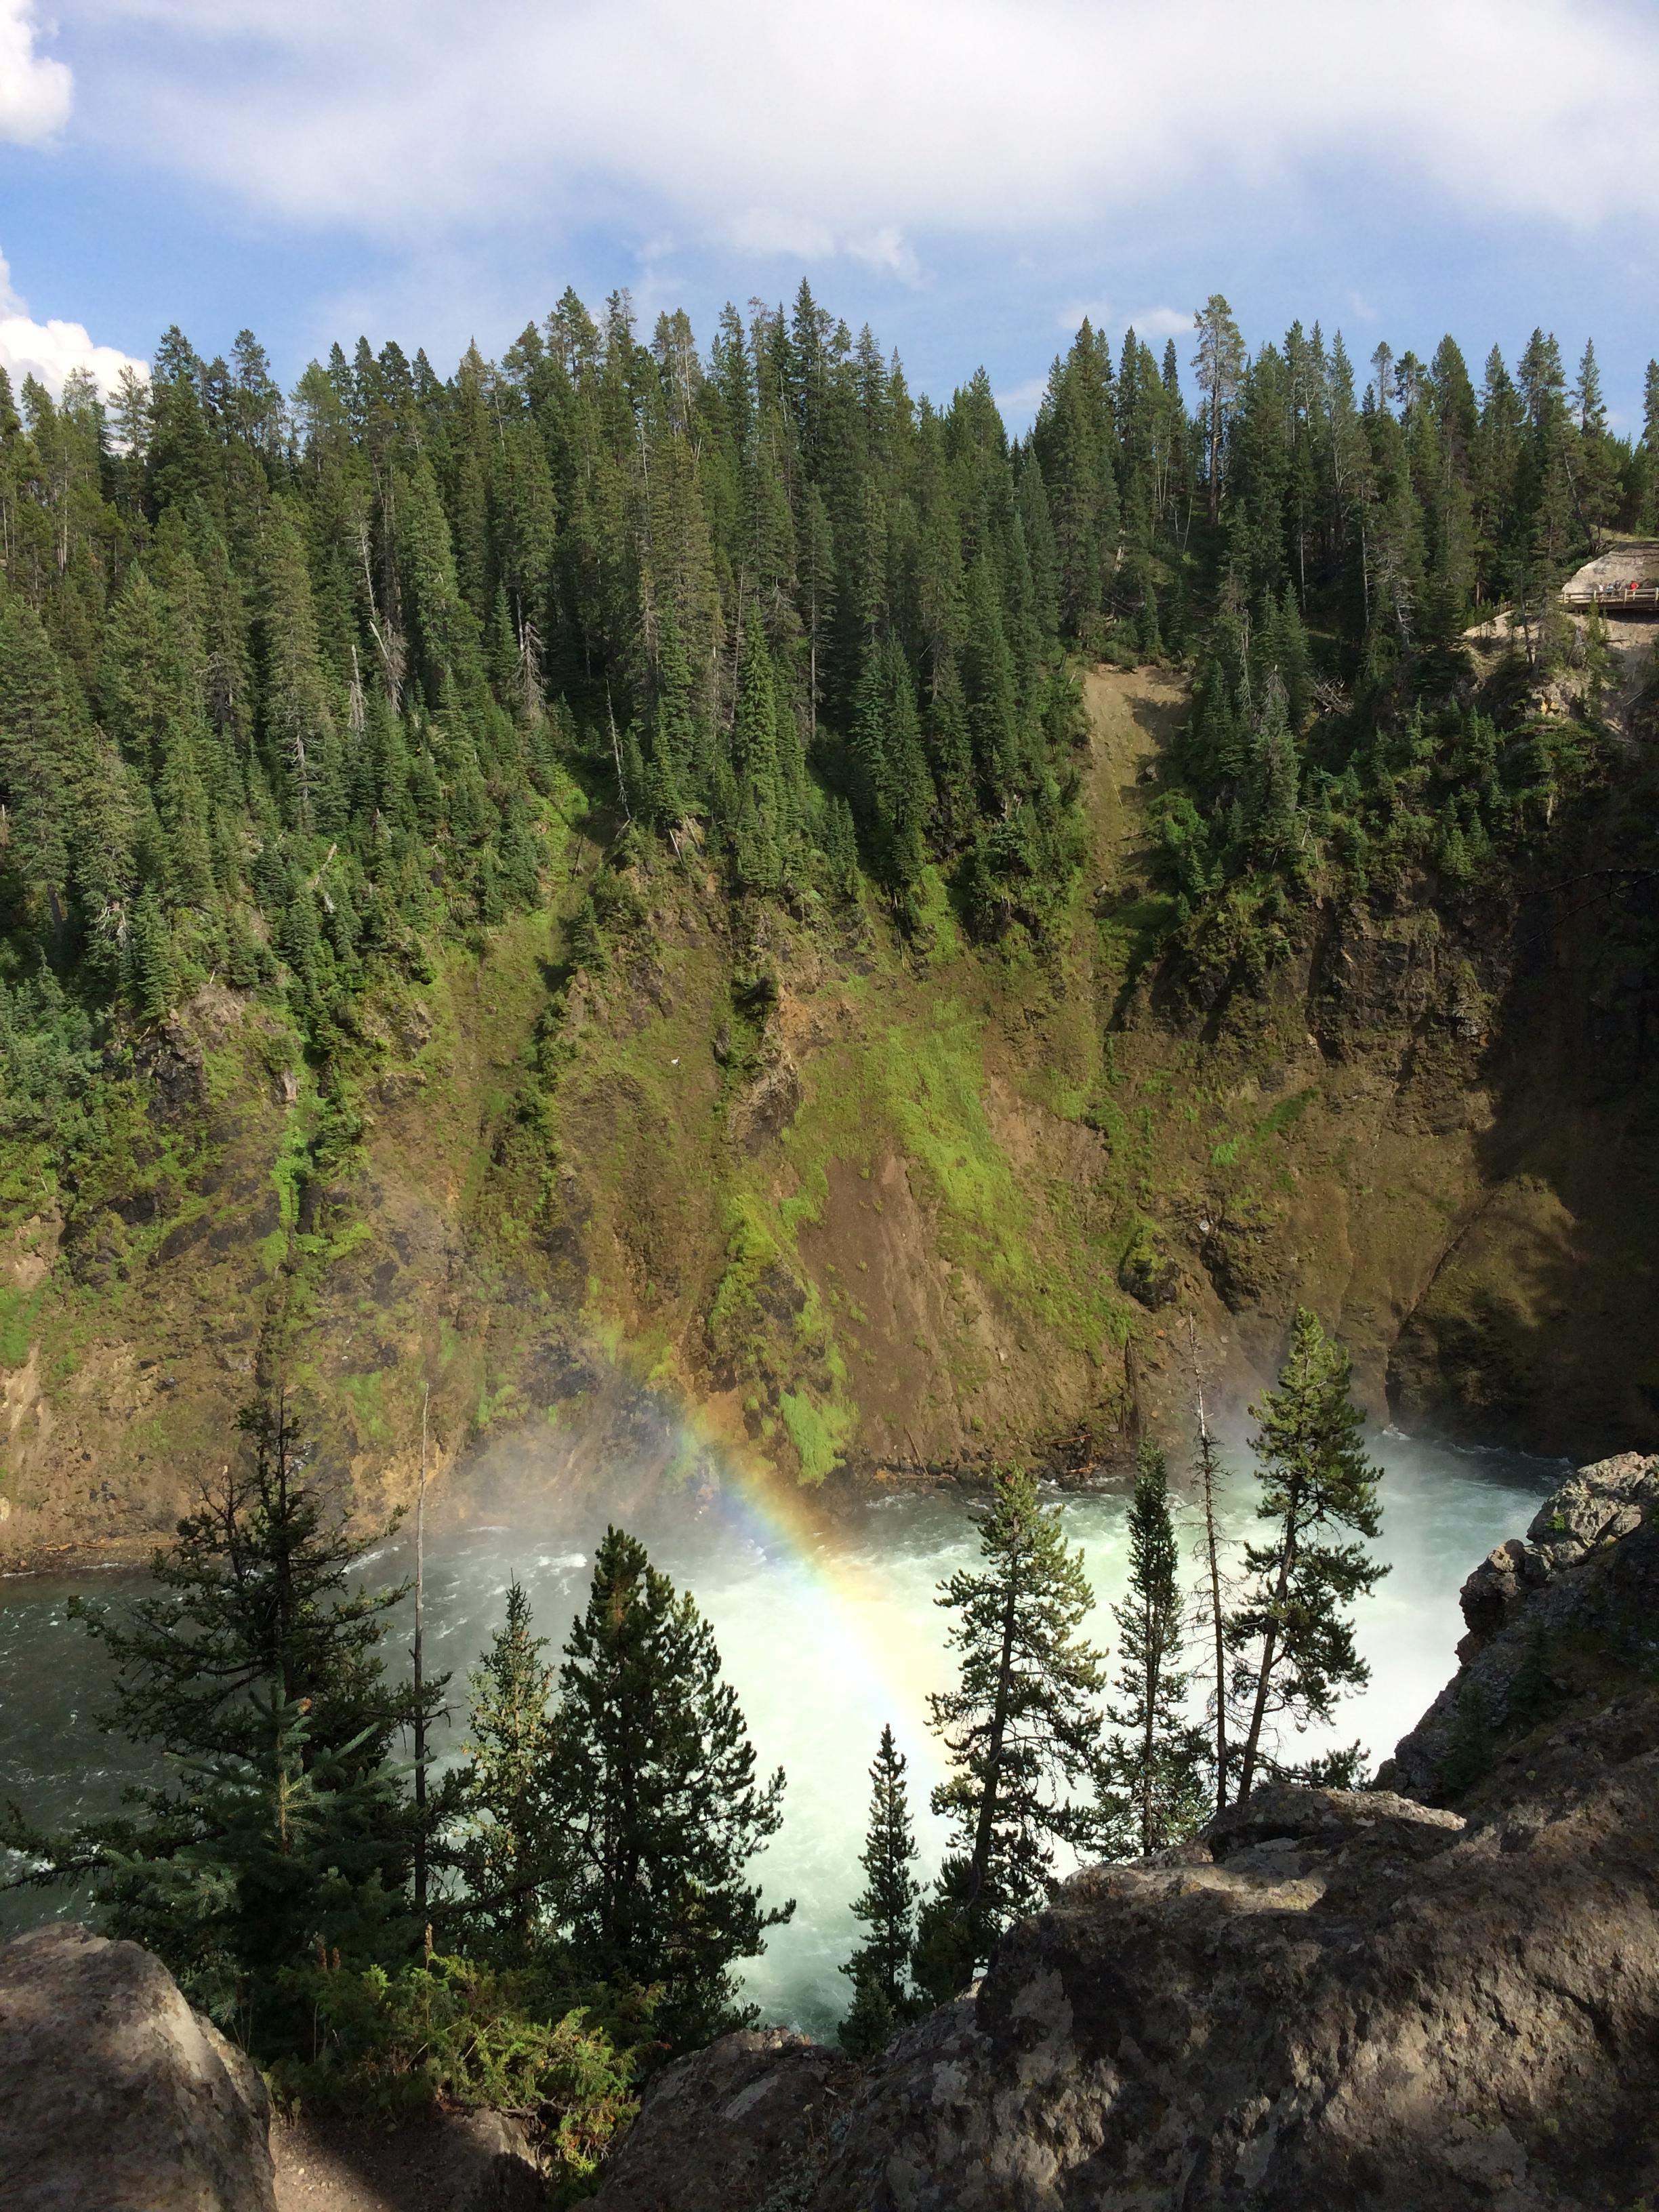 Rainbow over canyon falls